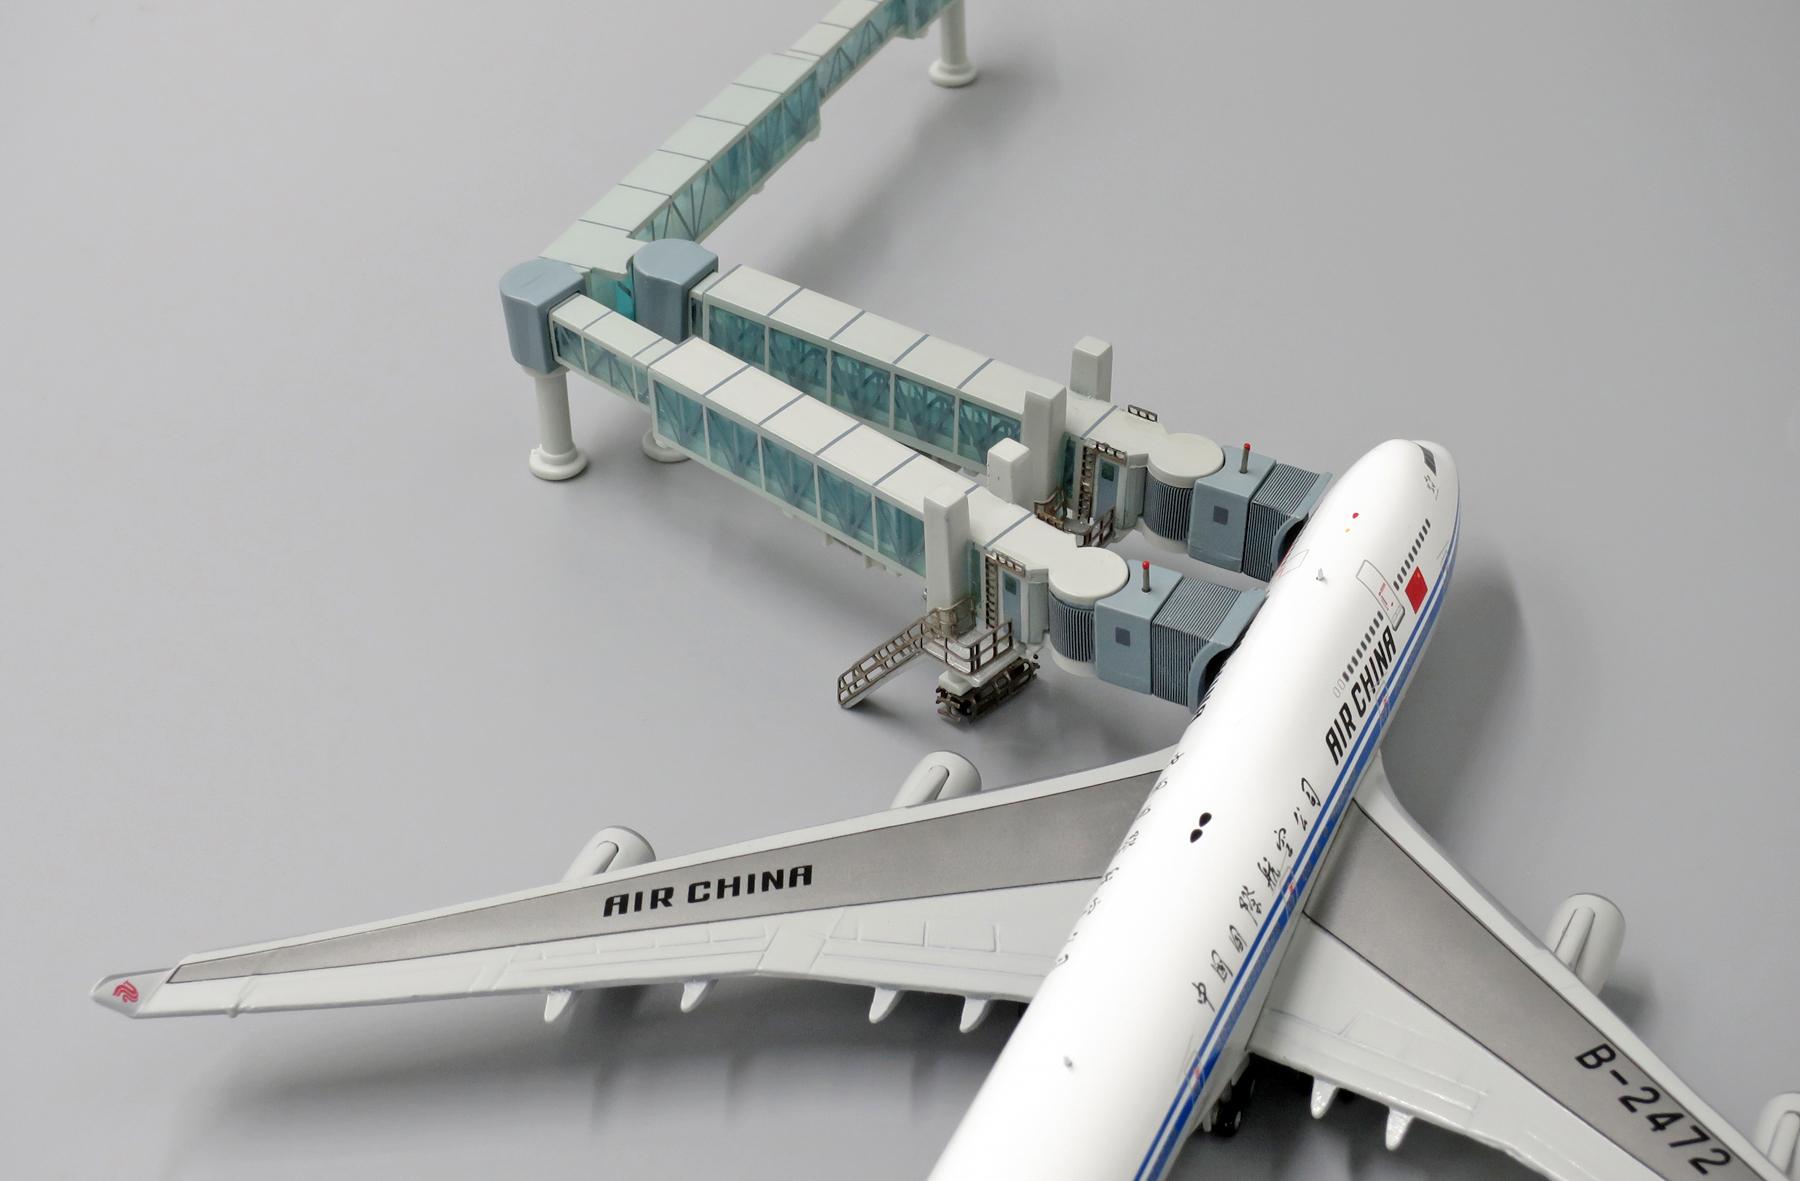 ScaleModelStore.com :: JC Wings 1:400